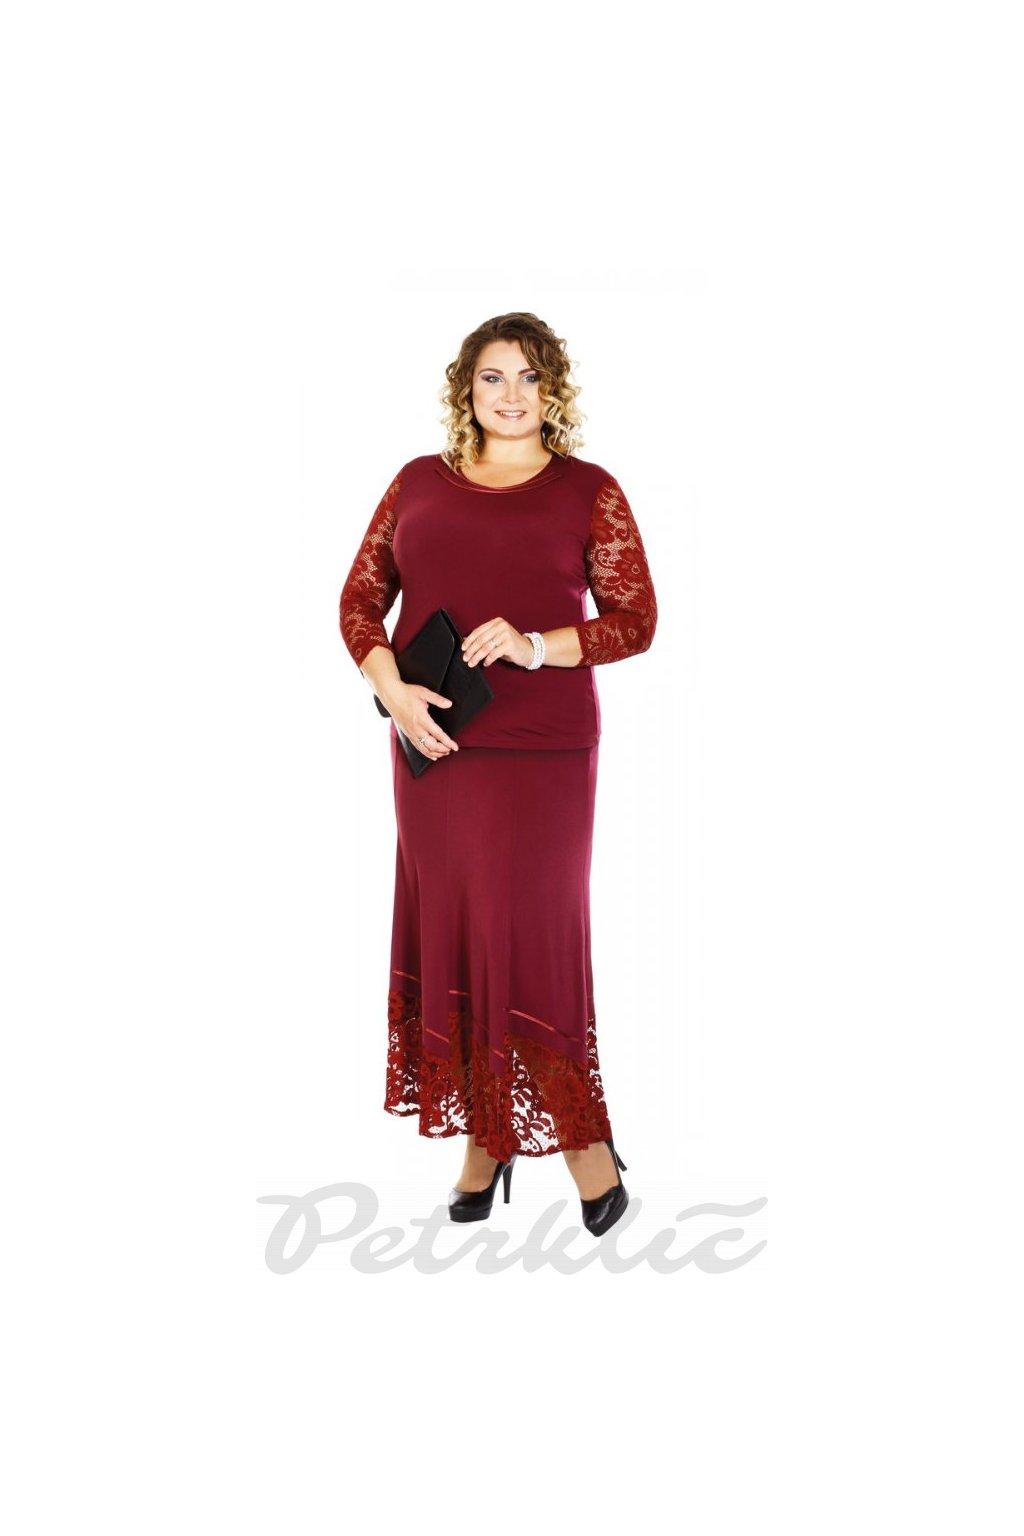 ARANKA - sukně 80 - 85 cm